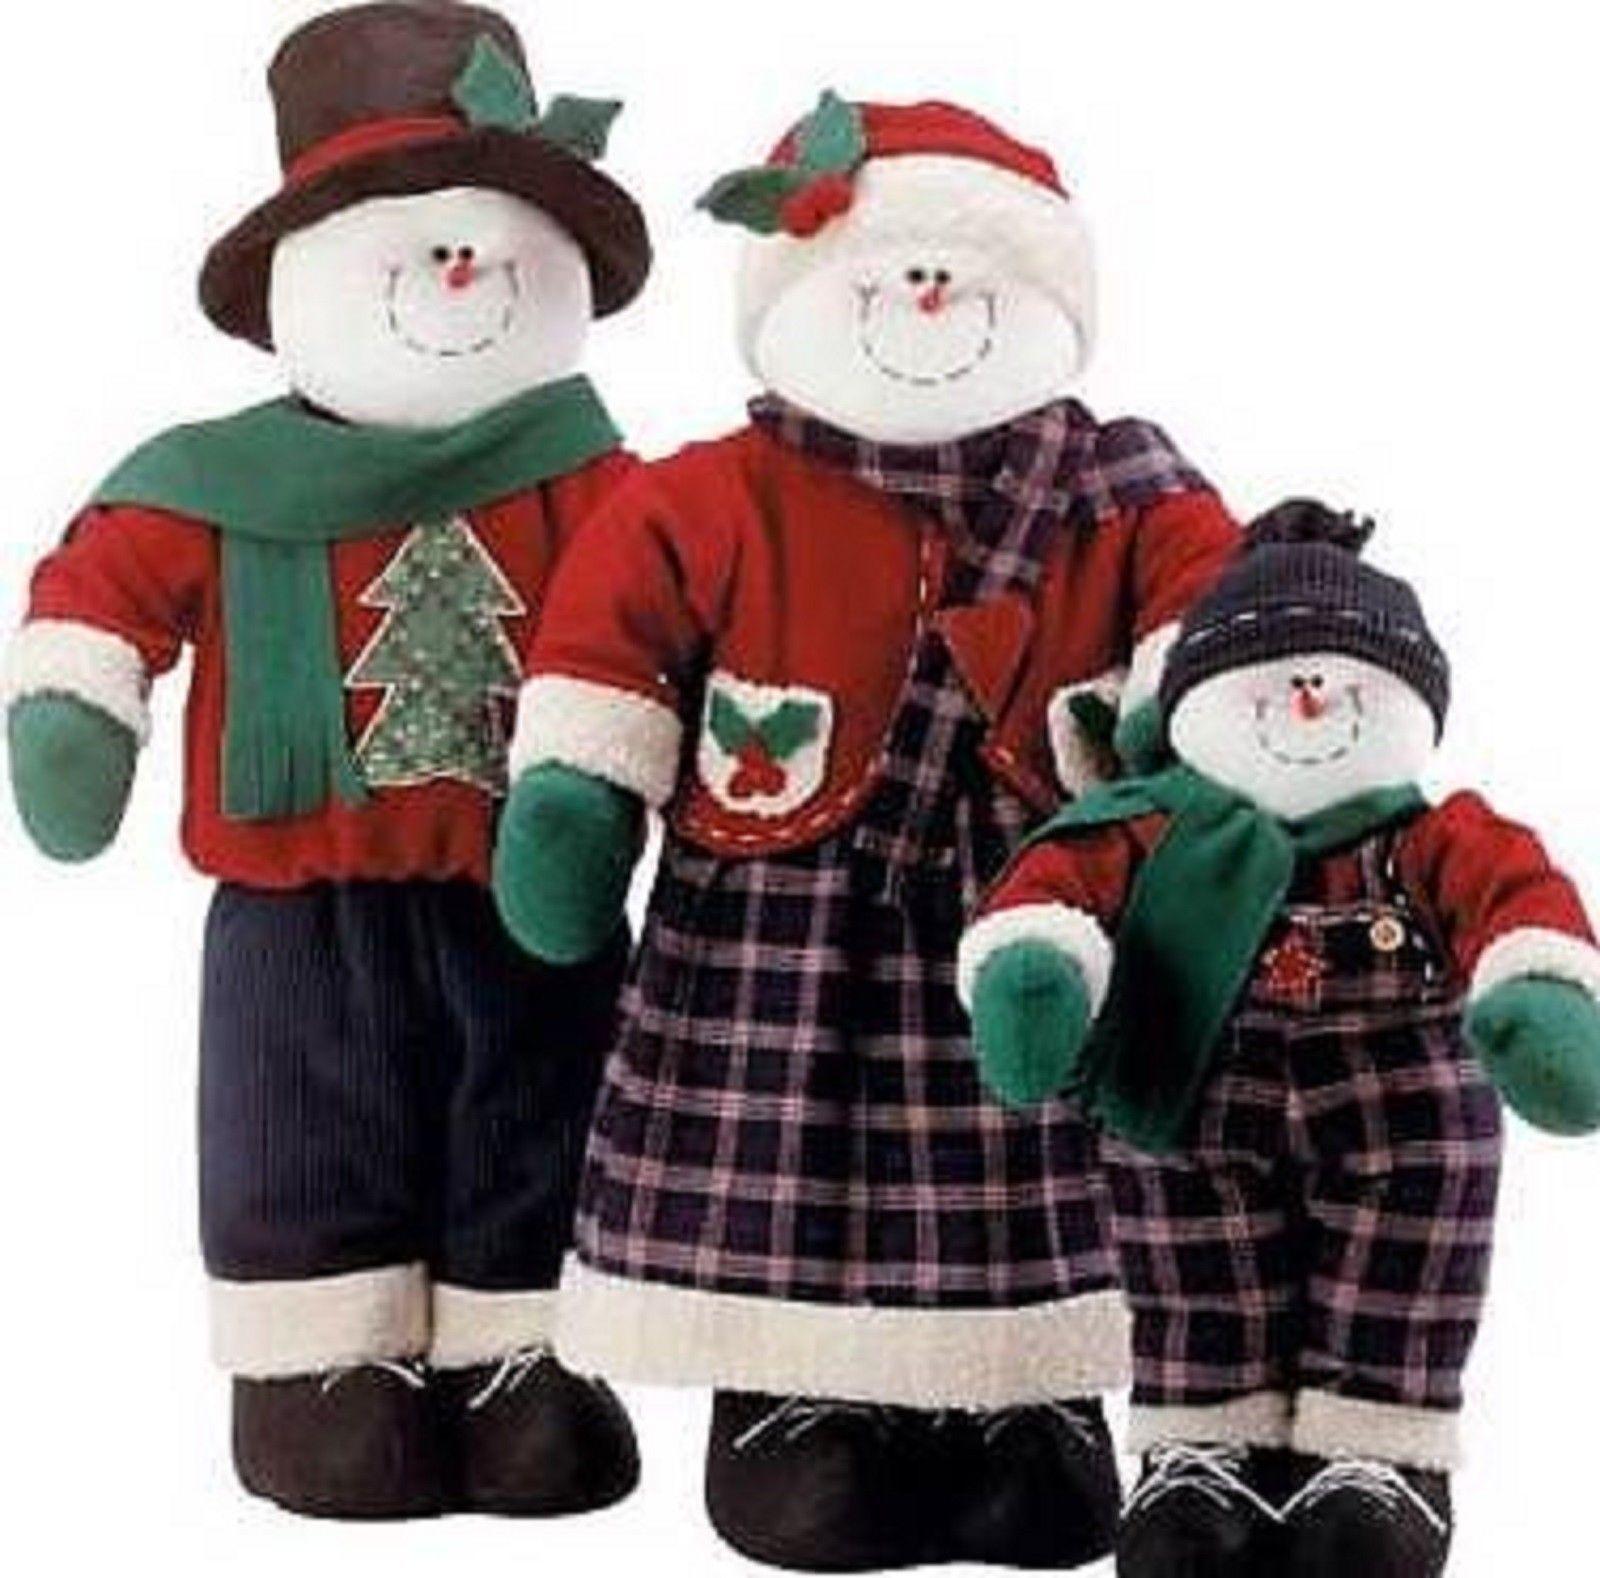 Christmas Snowman Family Figurine Holiday Figures Set Of 3 New